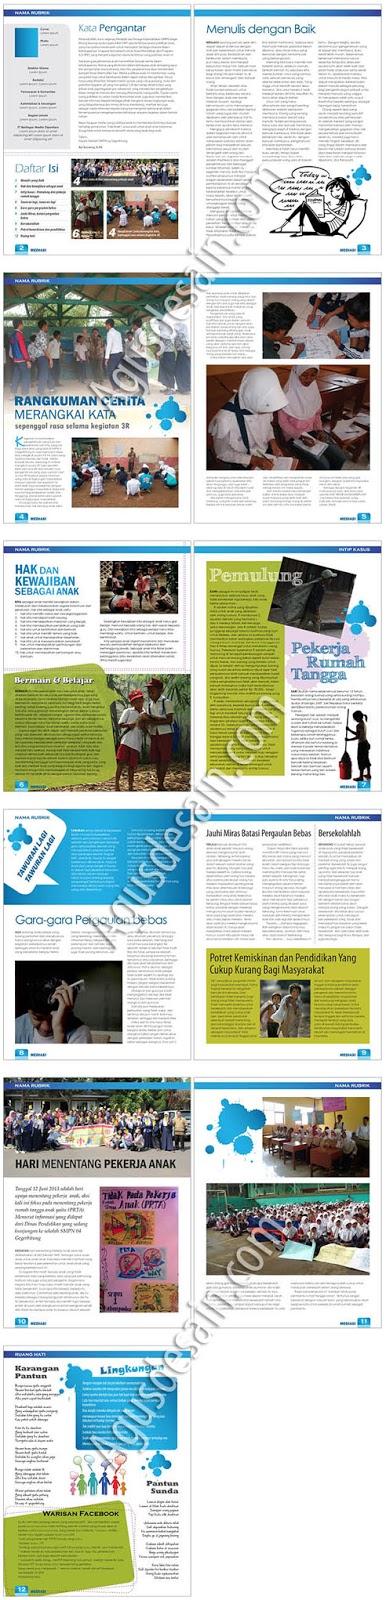 Contoh Majalah Sekolah